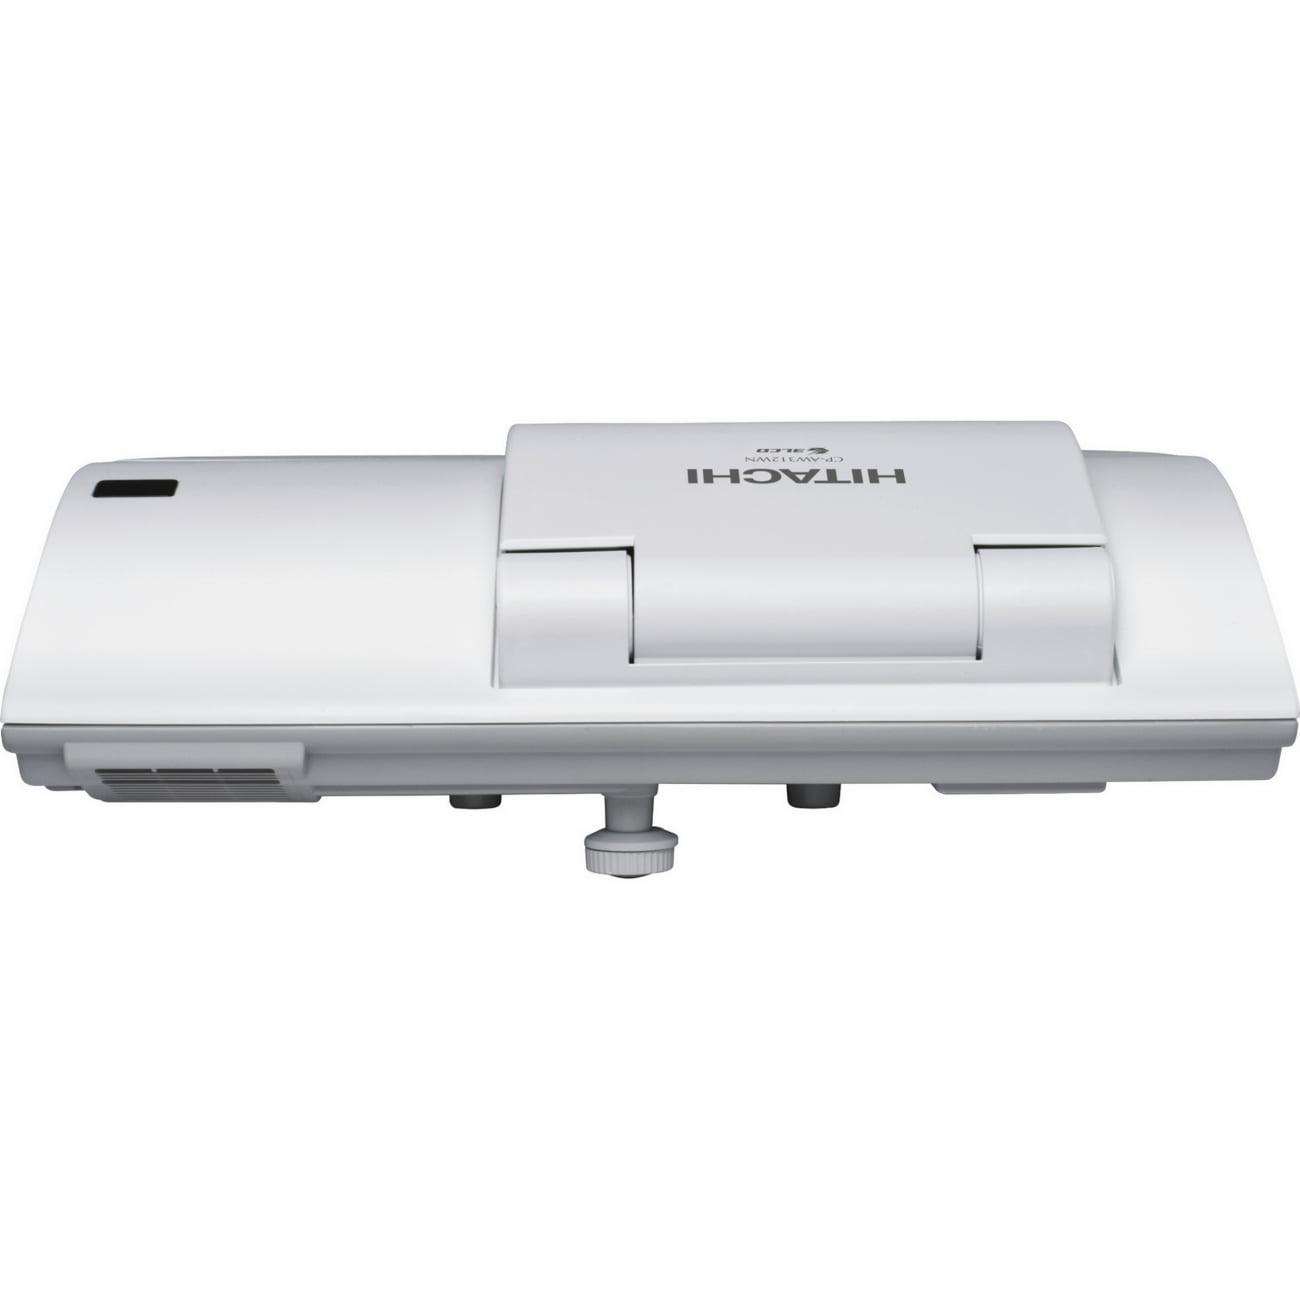 Hitachi CP-AW312WN 720p 1280x800 WXGA 3000 ANSI Lumens LCD Projector CPAW312WN by Hitachi, Ltd